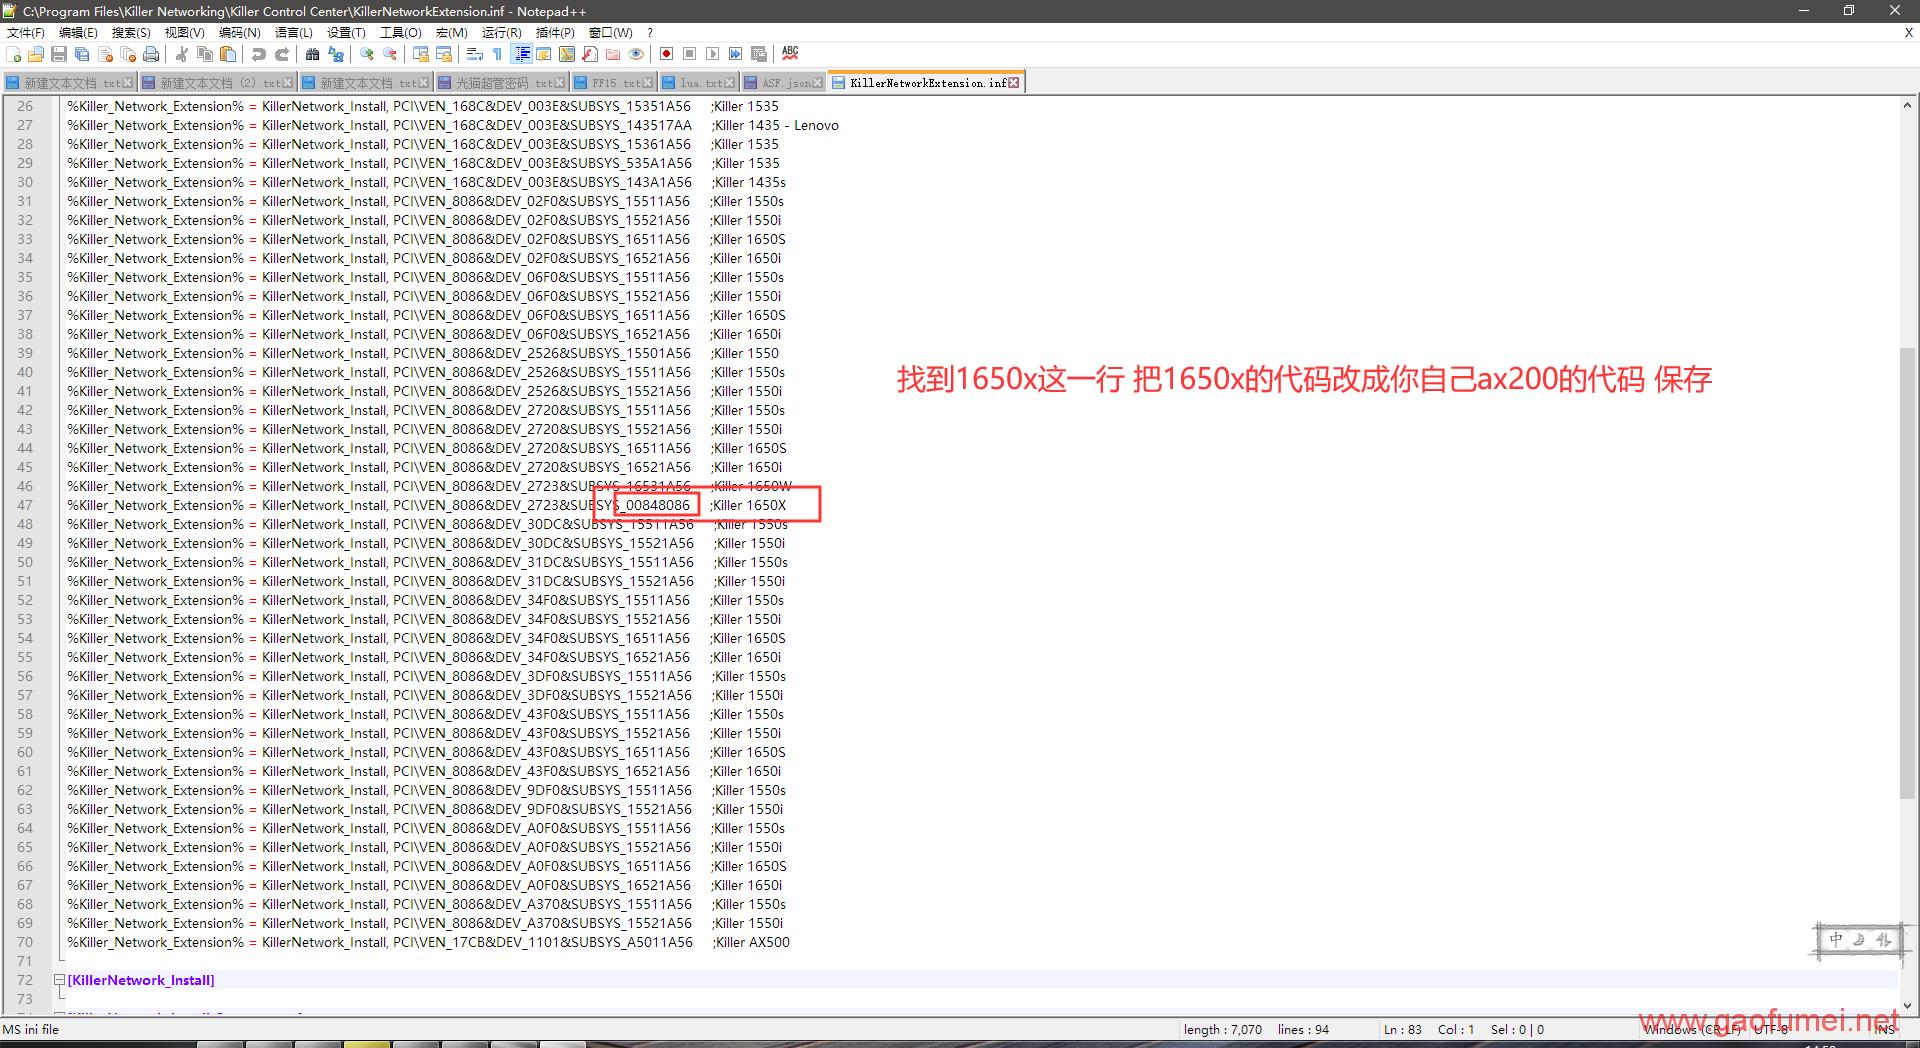 Intel AX200ngw(wifi5属性的网卡)刷成微星 killer AX1650X(wifi6)的属性的方法(无线网卡刷固件)分享 硬件问题 第6张-泥人传说